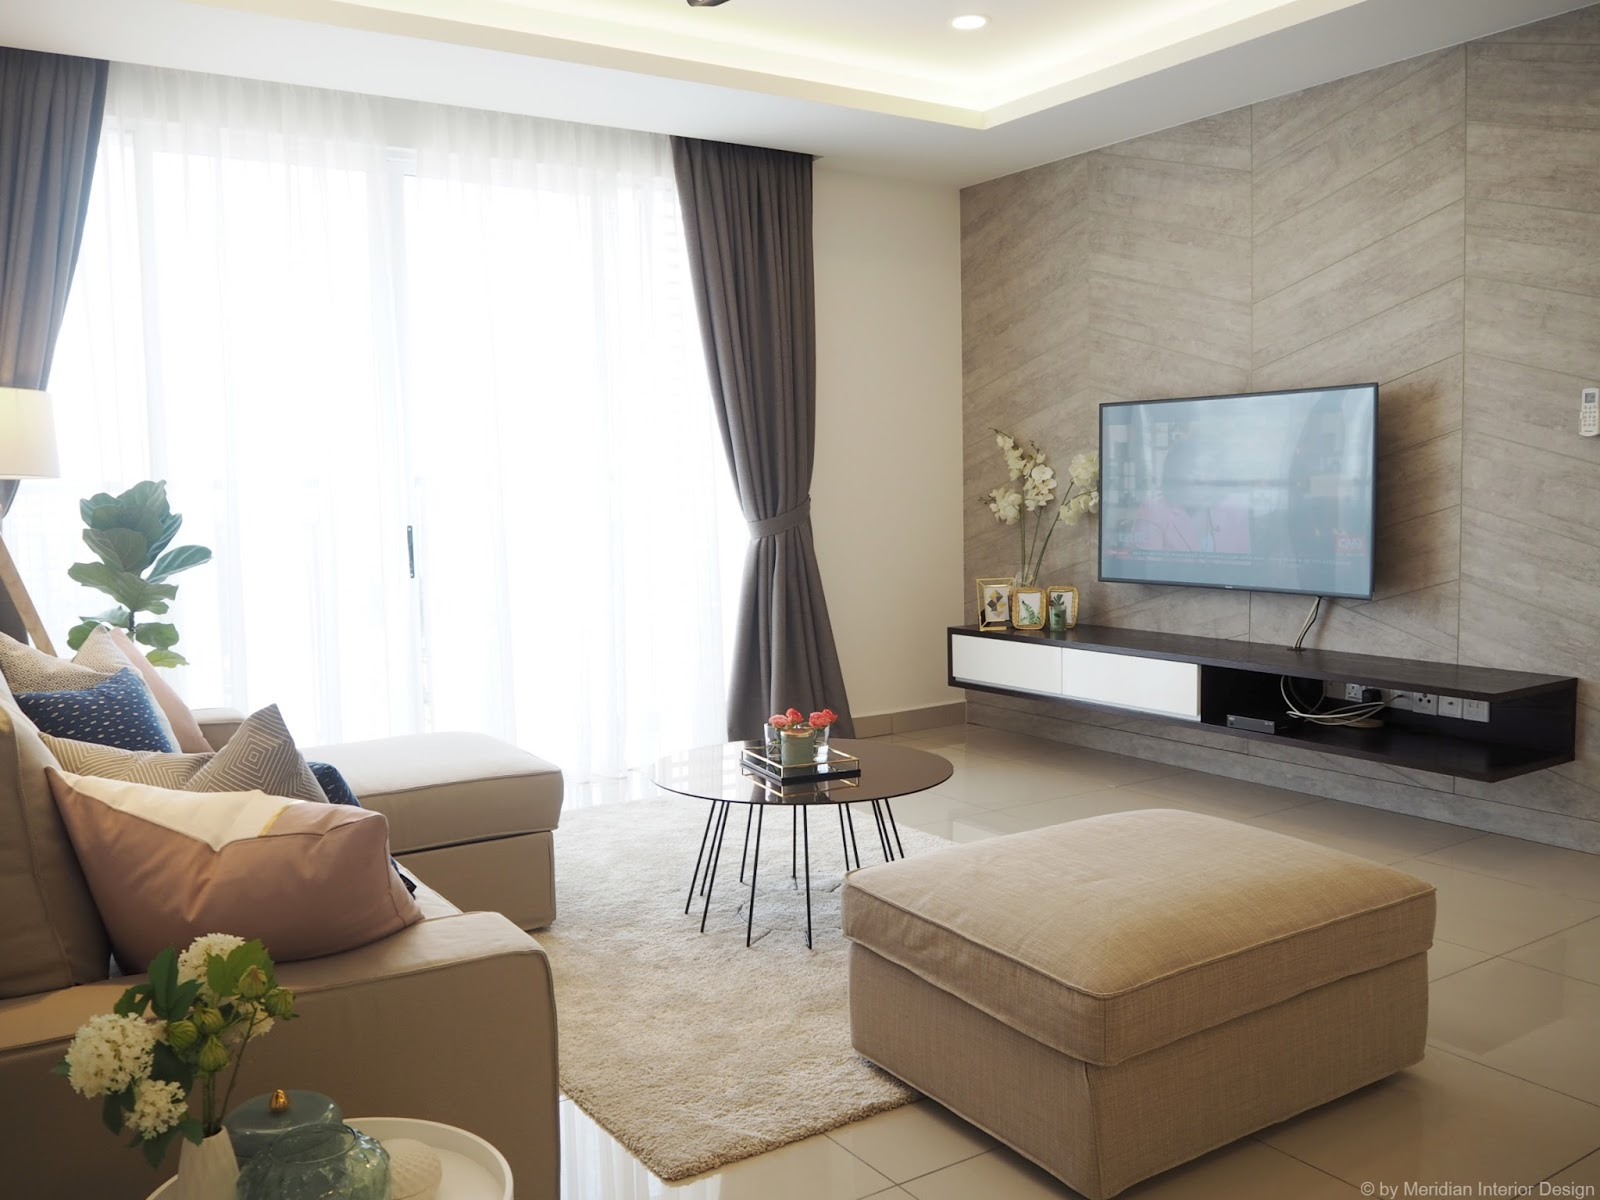 Meridian Design kitchen cabinet and interior design blogMalaysia